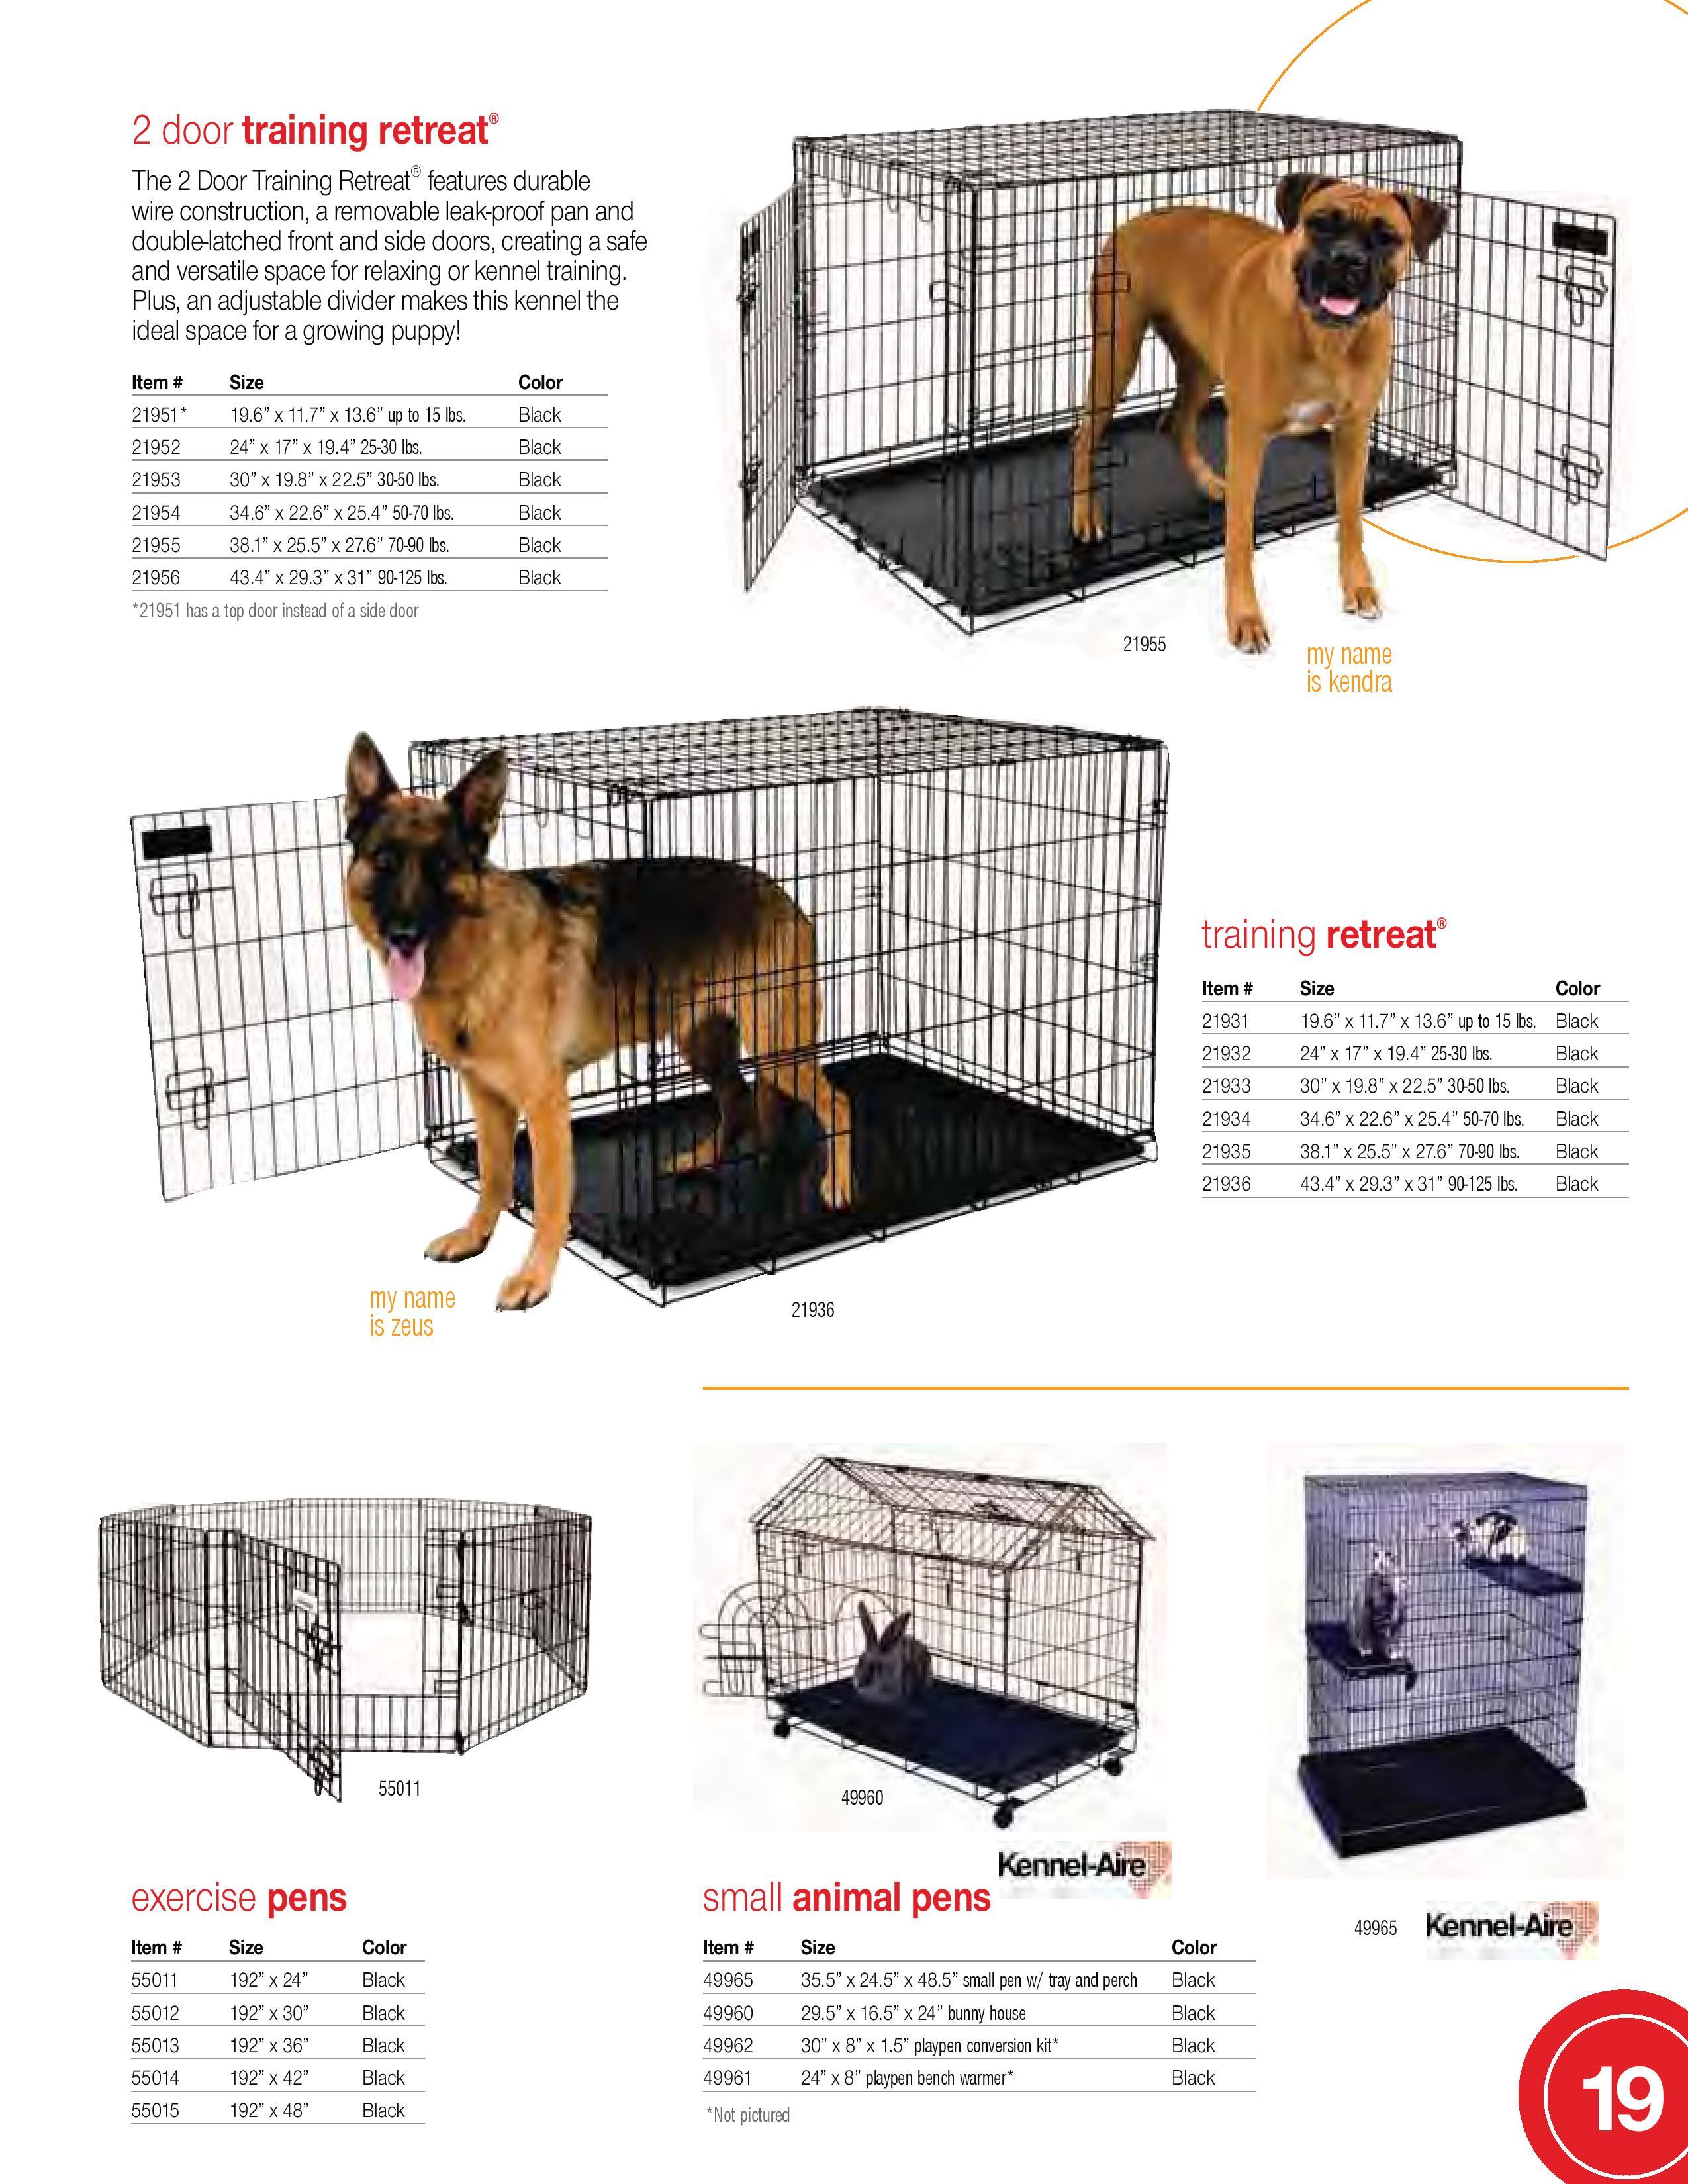 Emirtaes Animals Export 1 (19)